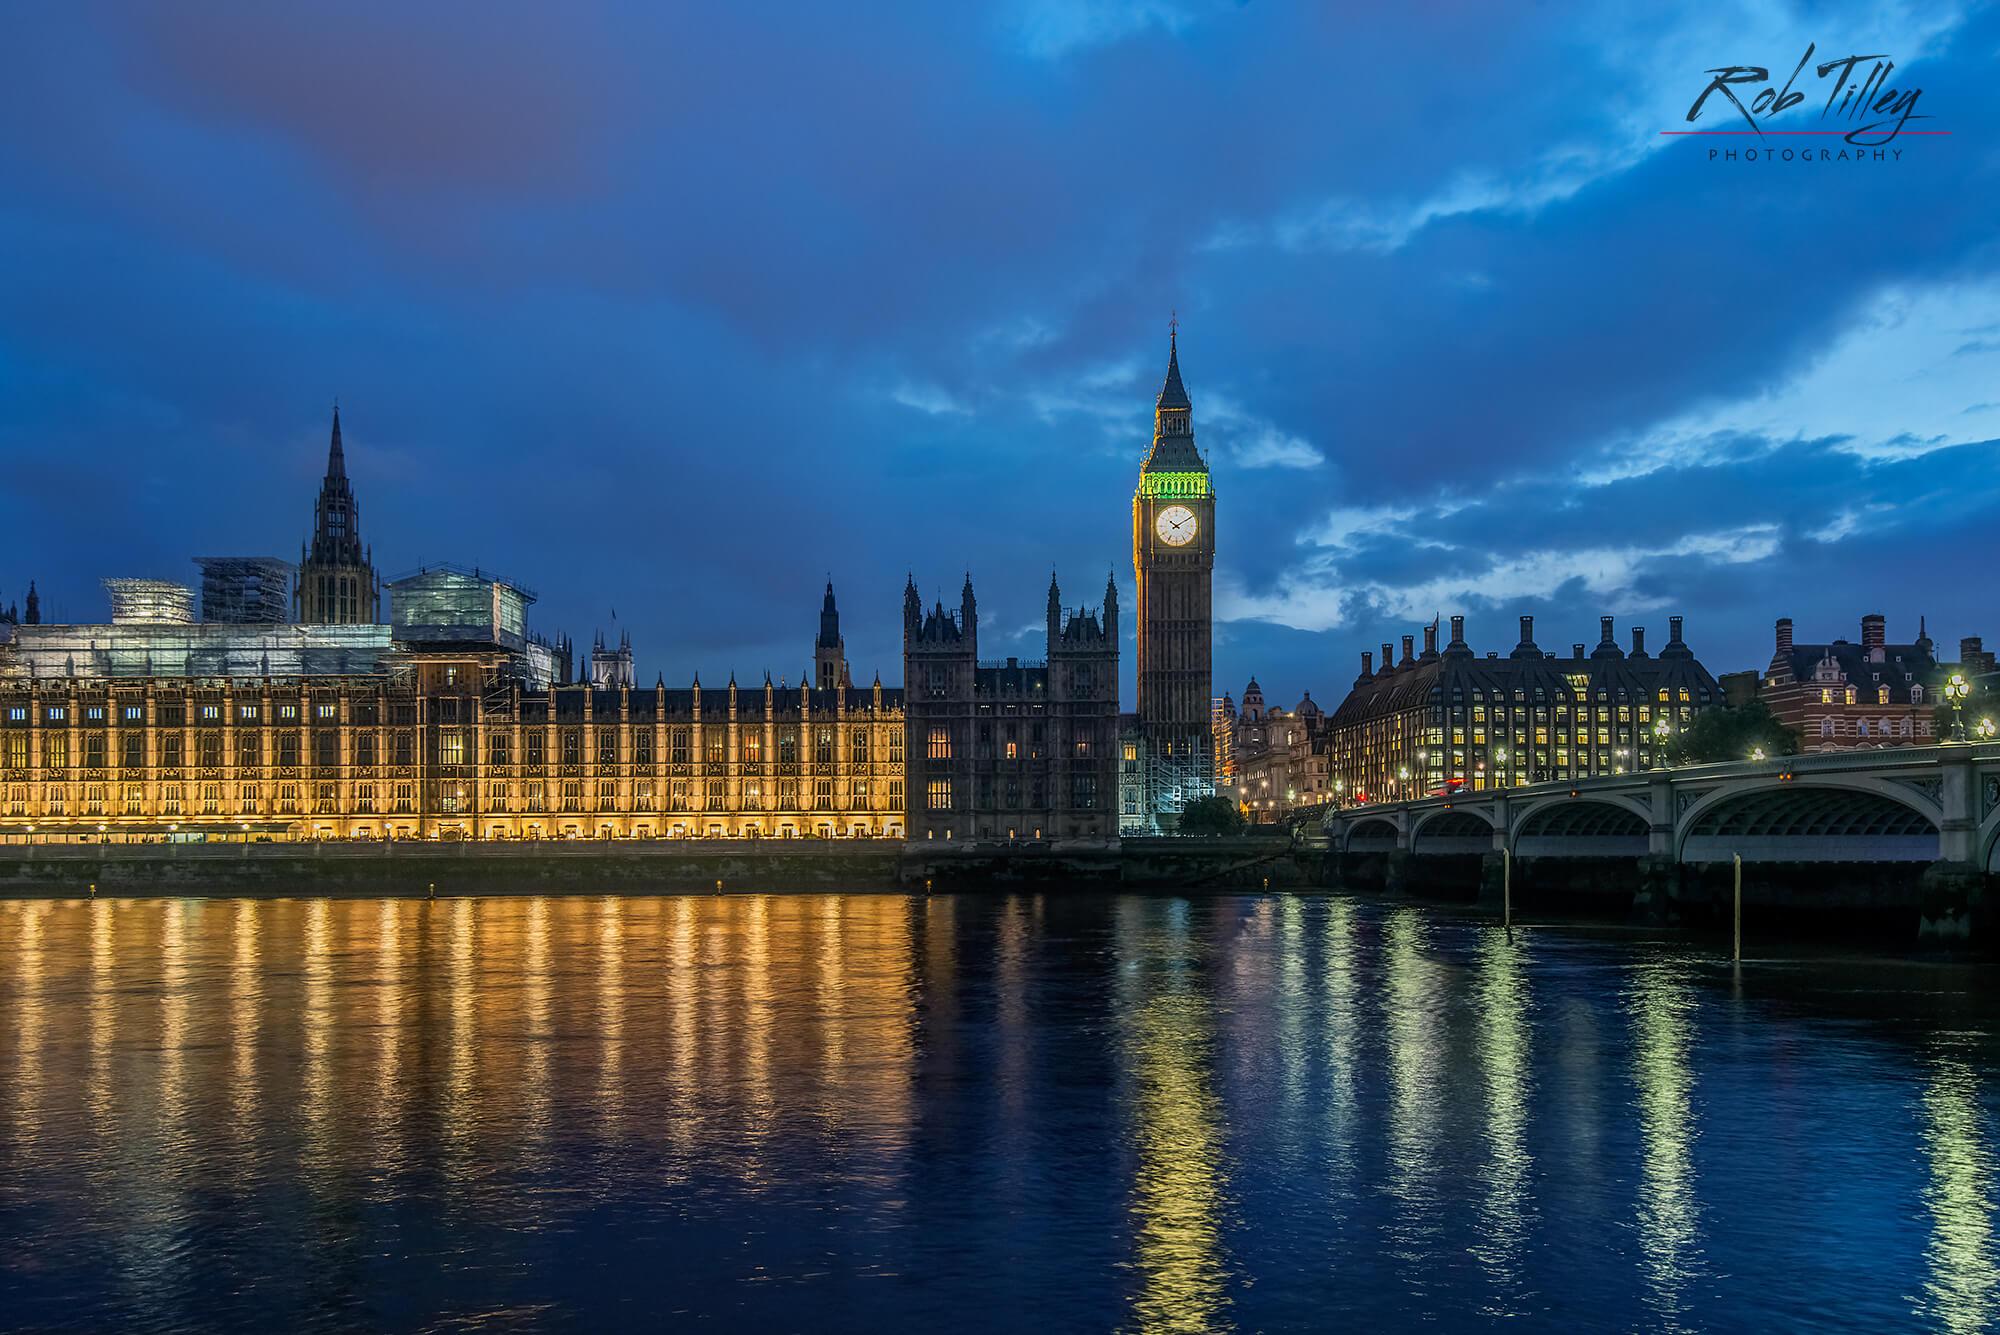 Parliament Reflections.jpg